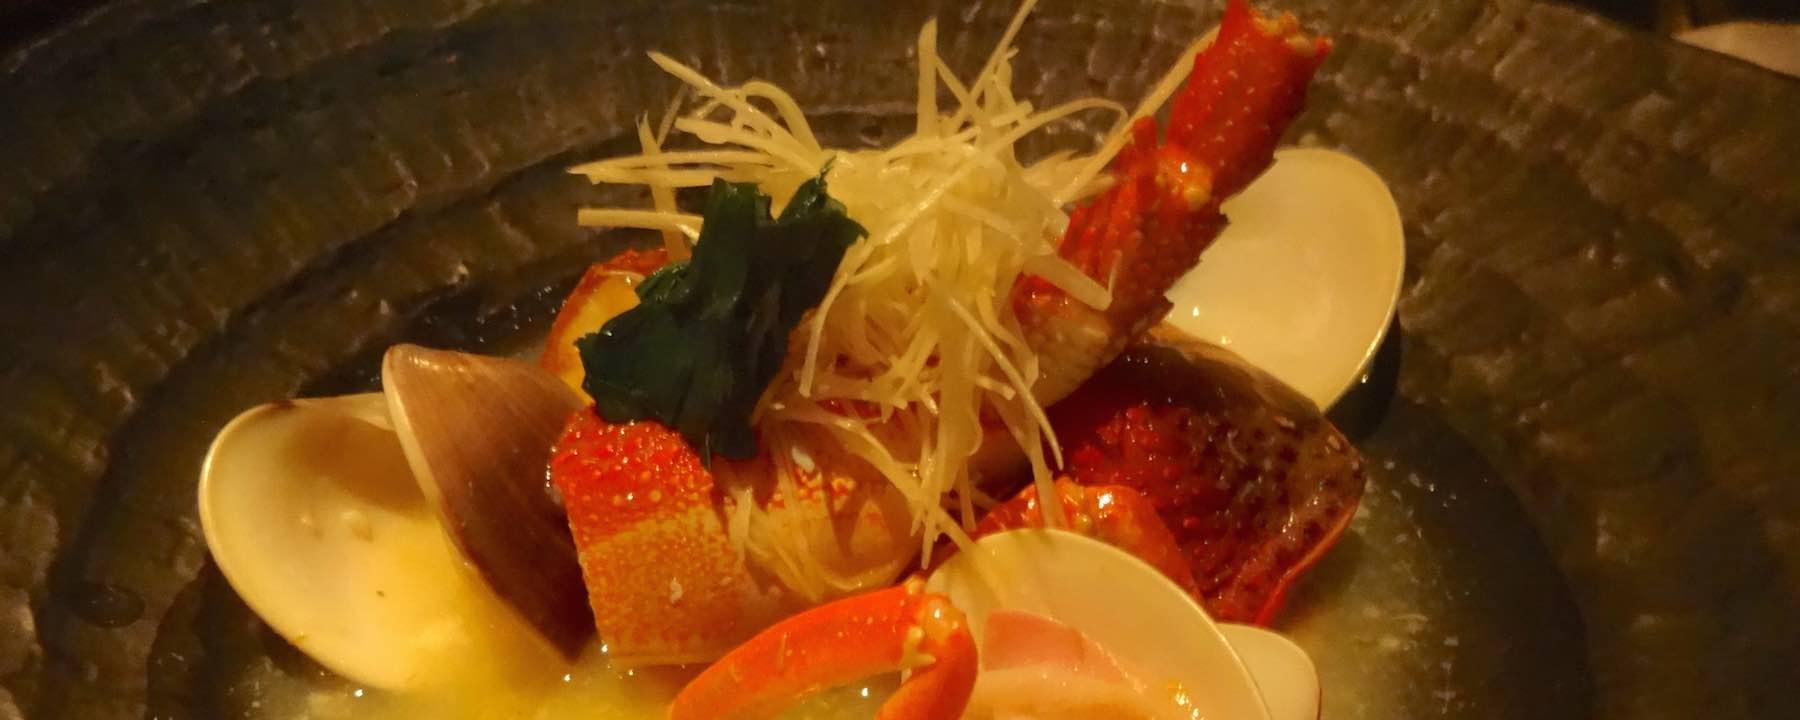 M cuisine best taipei sushi restaurant luxury bucket list m cuisine japanese restaurant in taipei amazing sushi fresh seafood forumfinder Image collections